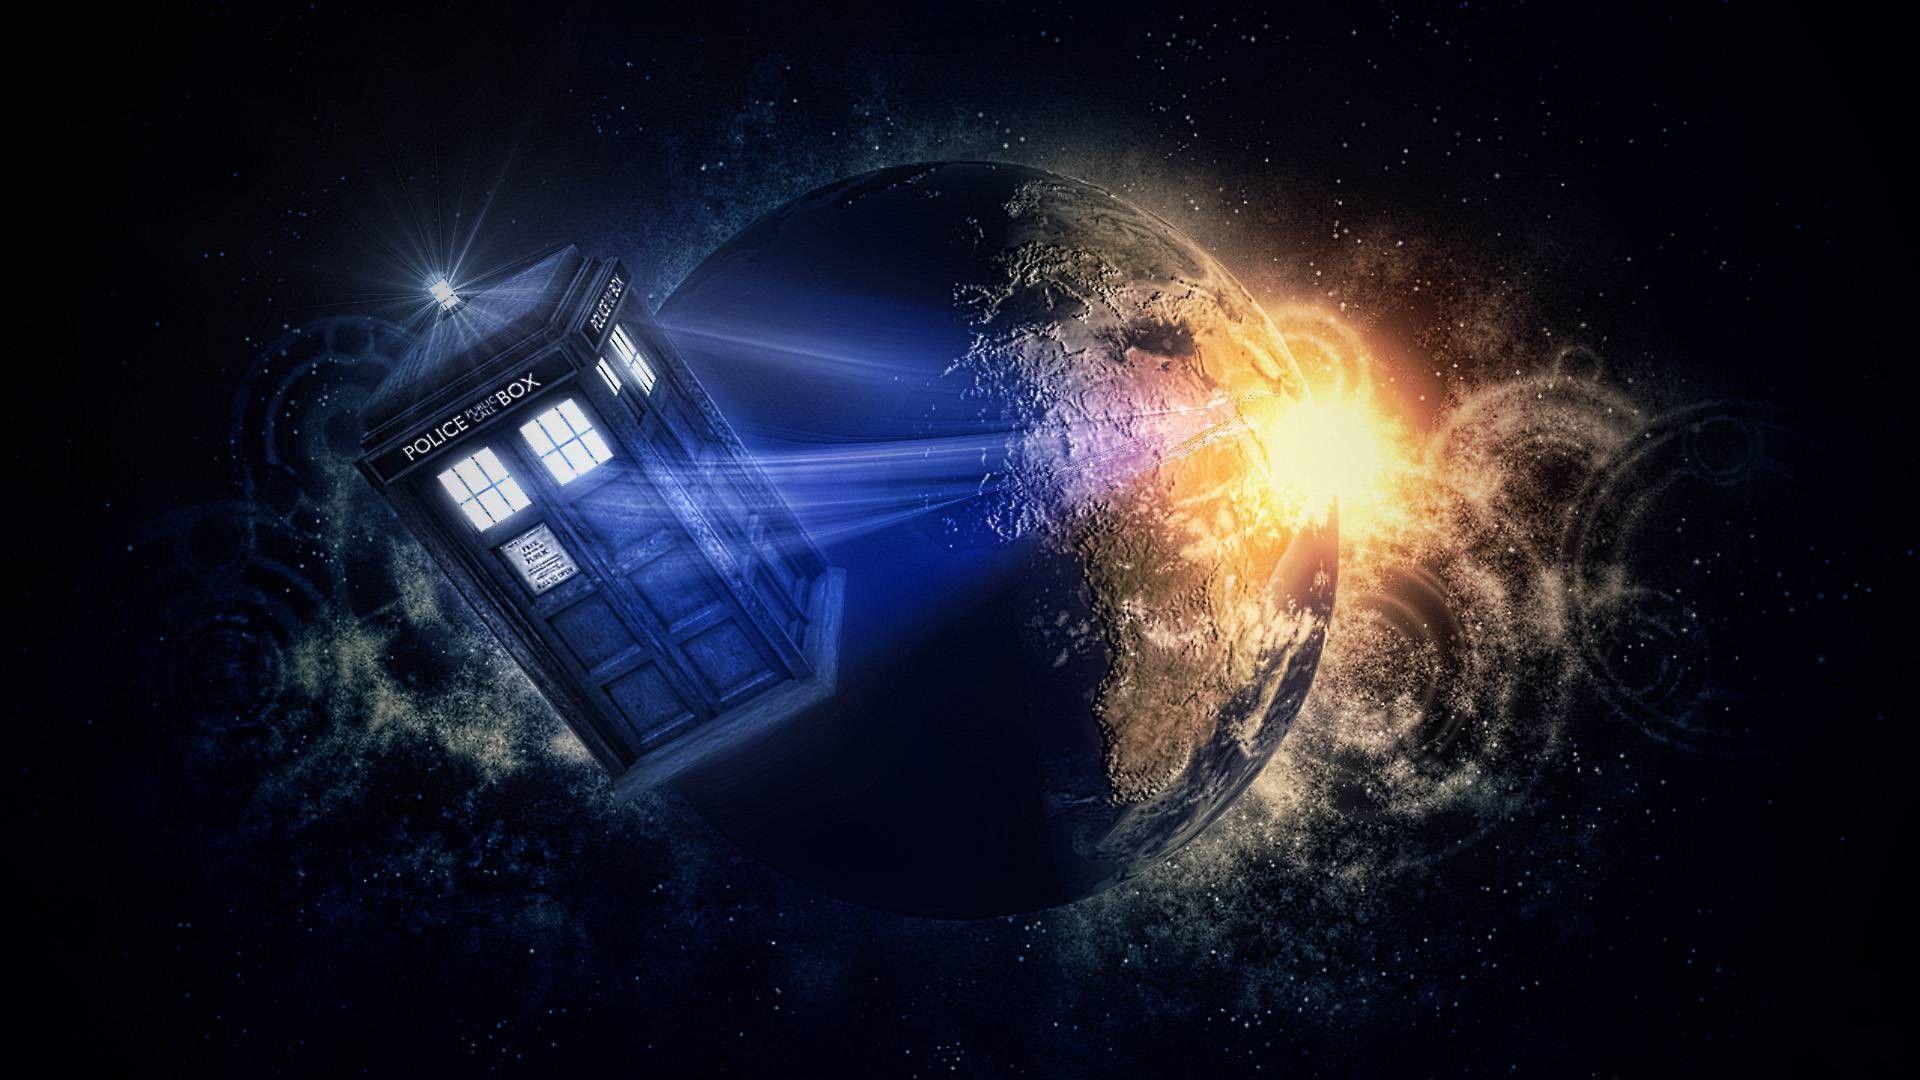 doctor who wallpaper hd 130227 pixels doctor who wallpaper rh pinterest com